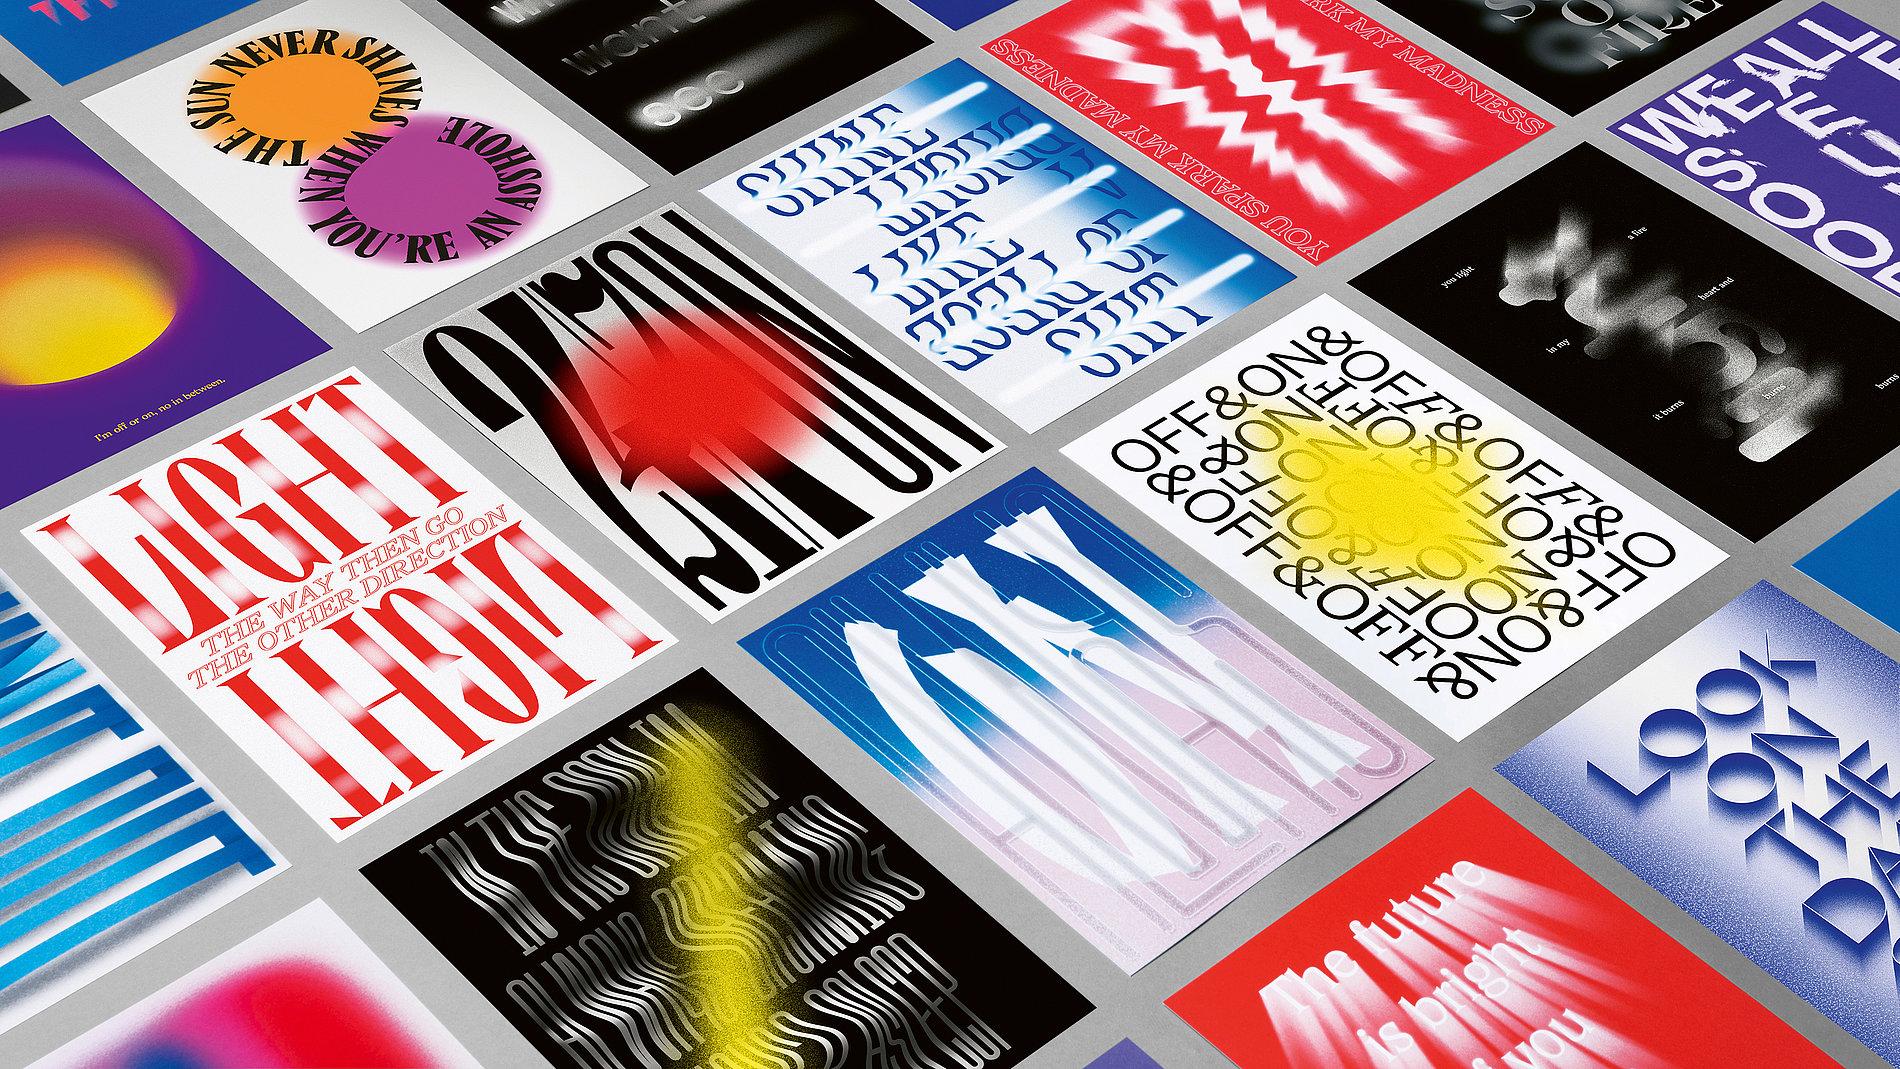 Zumtobel Group Annual Report 2017/2018 | Red Dot Design Award